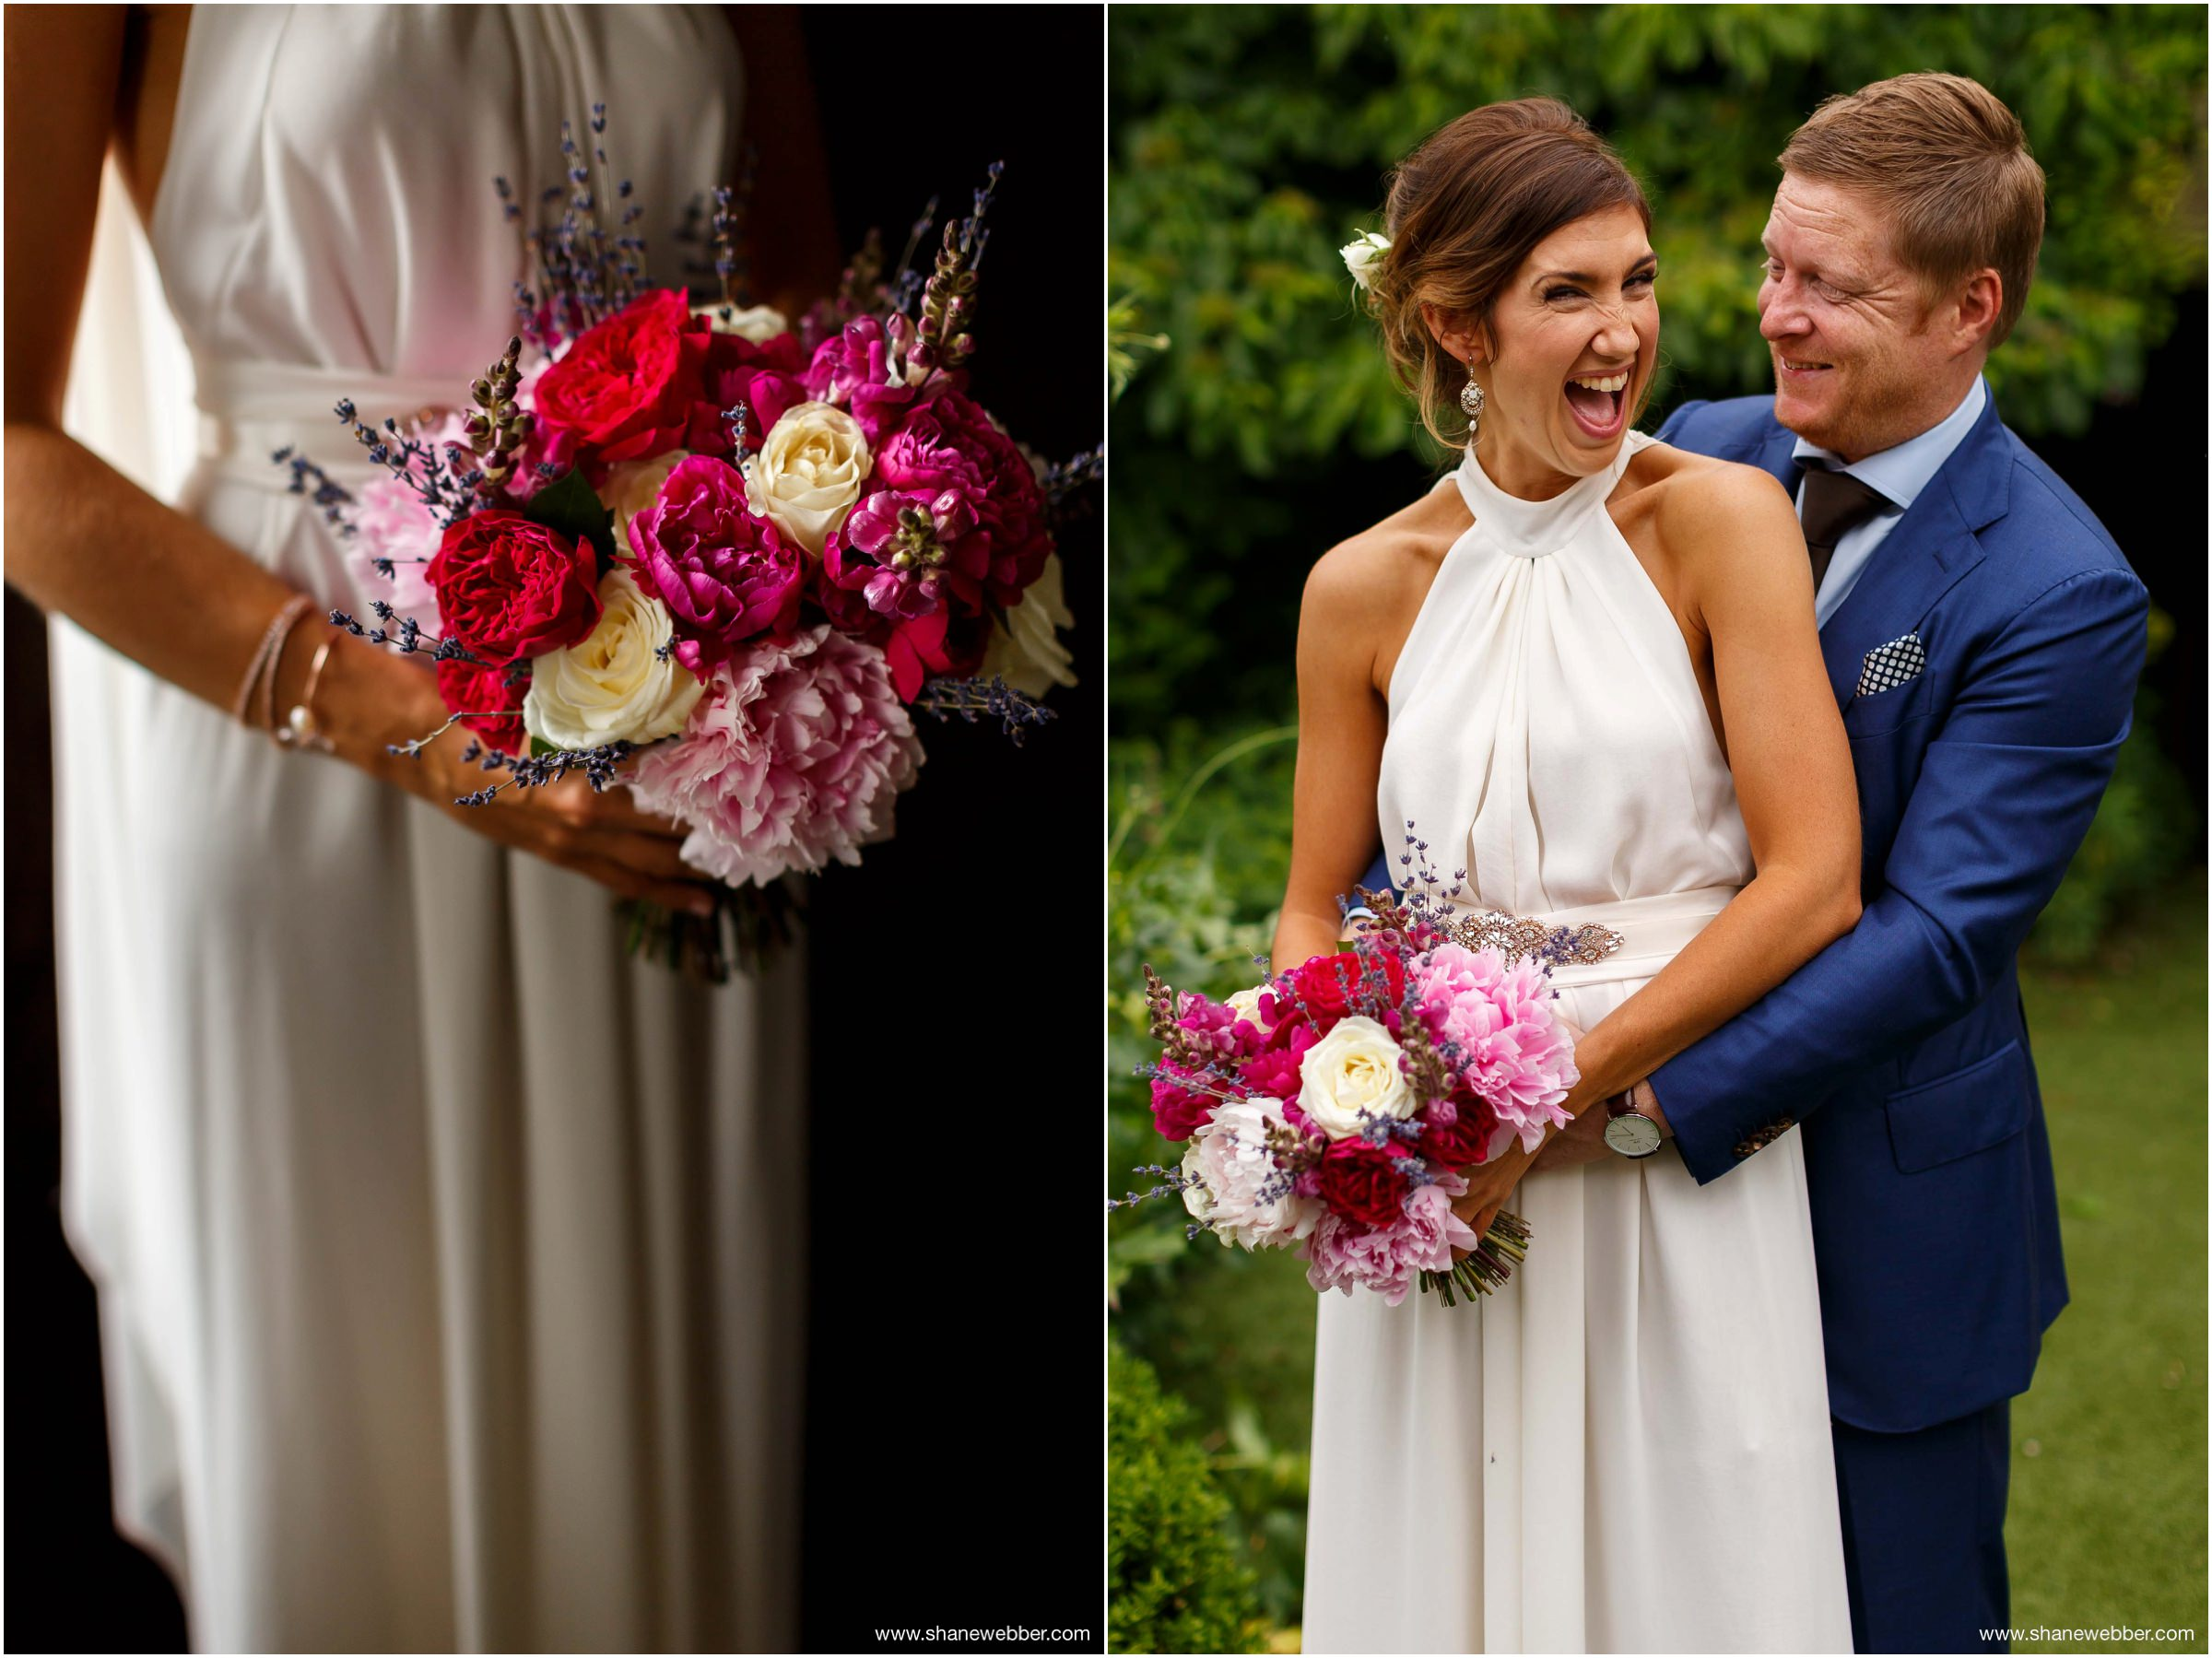 Australian bride and groom at English wedding